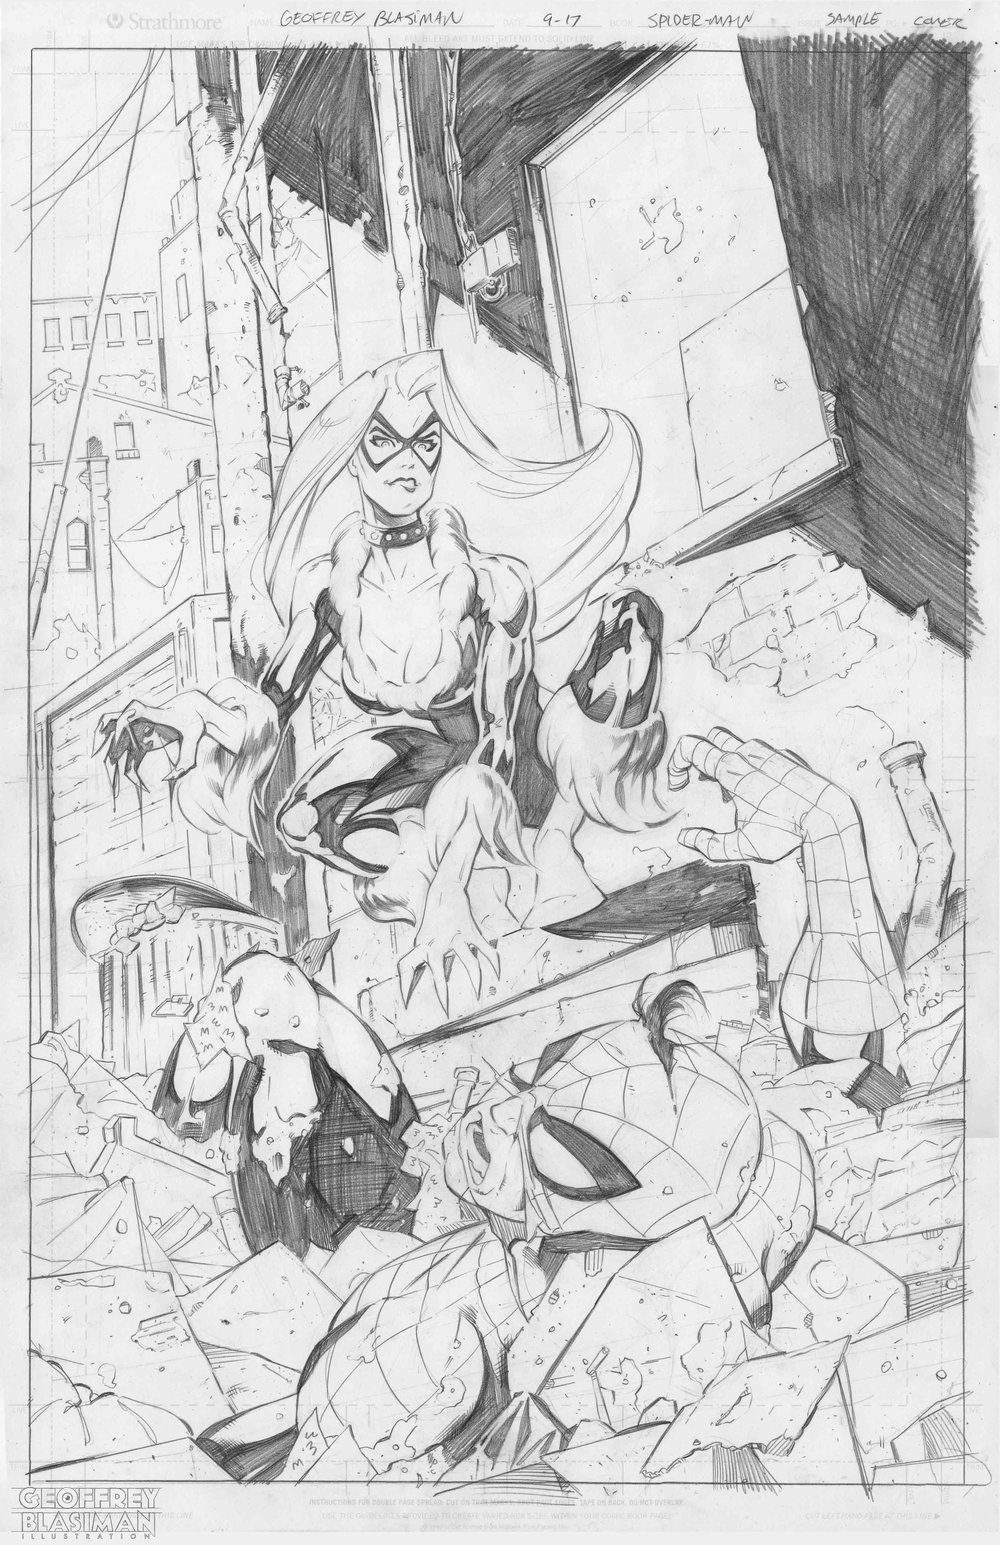 Spider-Man_Cover_S.jpg